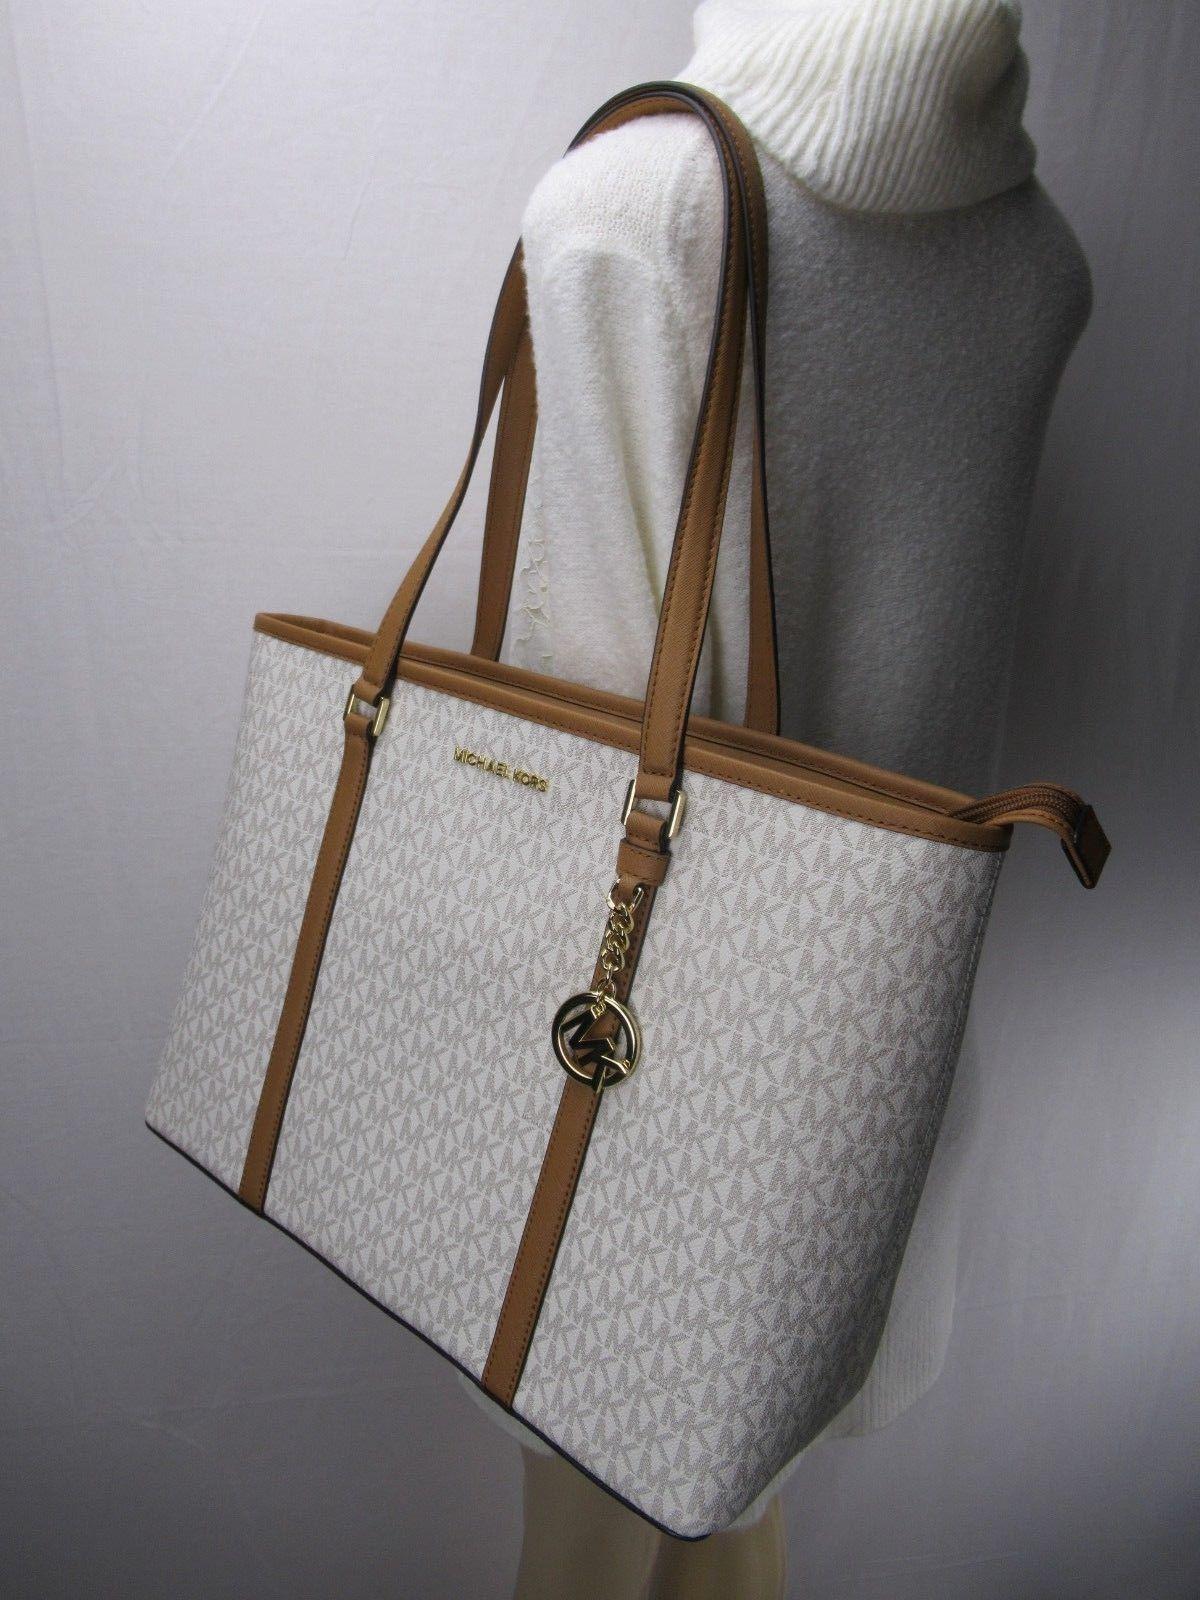 939b0b7bcb6f S l1600. S l1600. Previous. NWT Michael Kors PVC Sady Vanilla Large Weekender  Travel Tote Bag Laptop